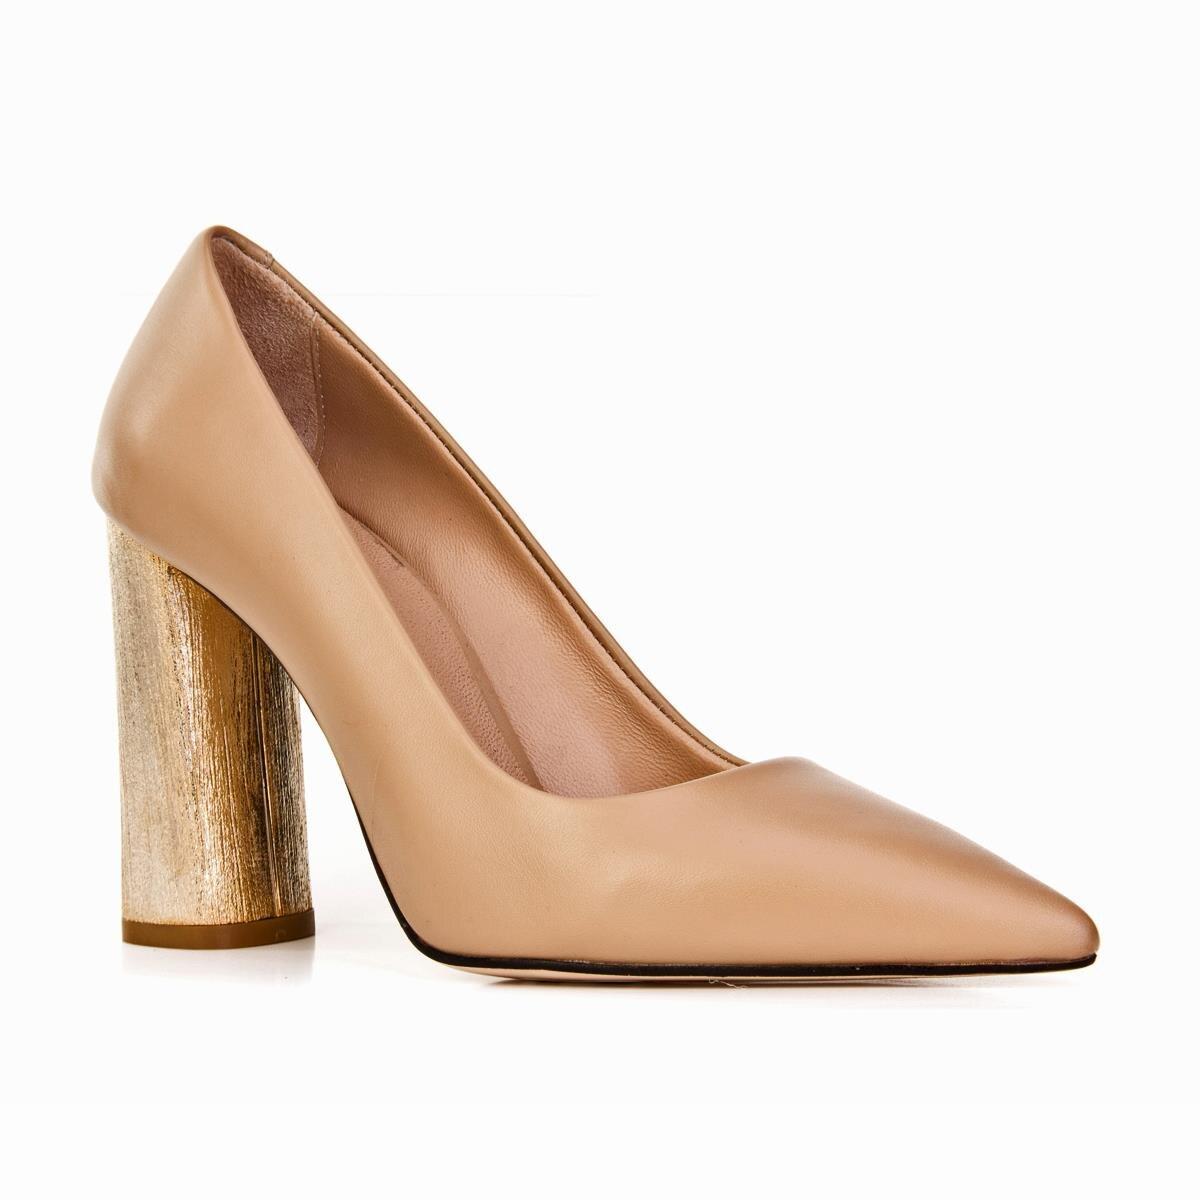 Cabaneri 97965 Neolıt Base okceleri chaussures-(Ms)-peau-Beige